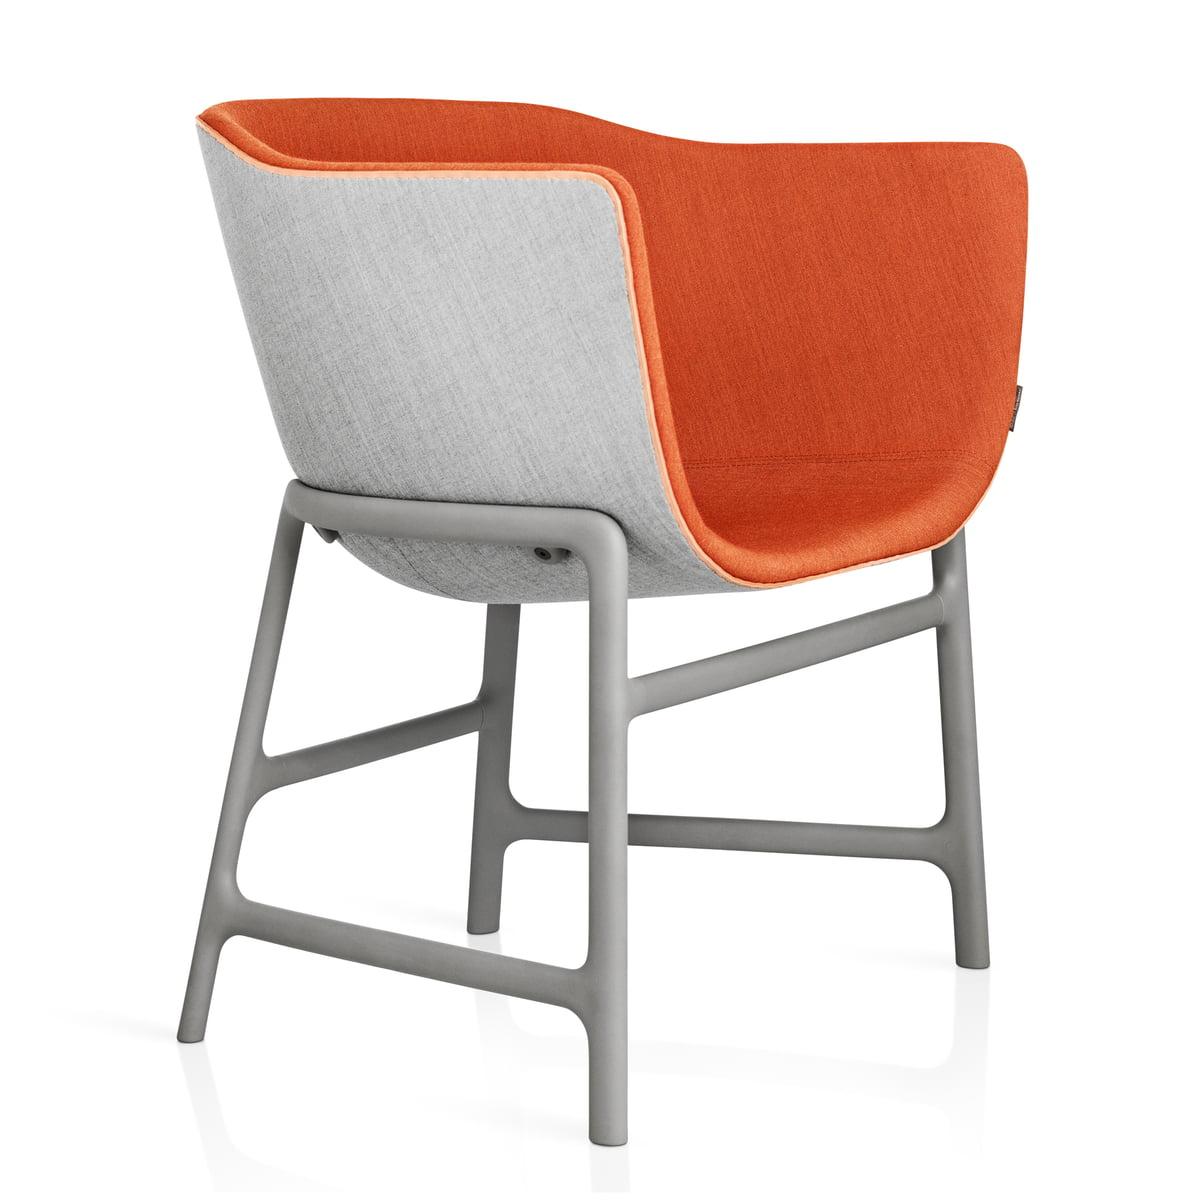 minuscule stuhl von fritz hansen. Black Bedroom Furniture Sets. Home Design Ideas